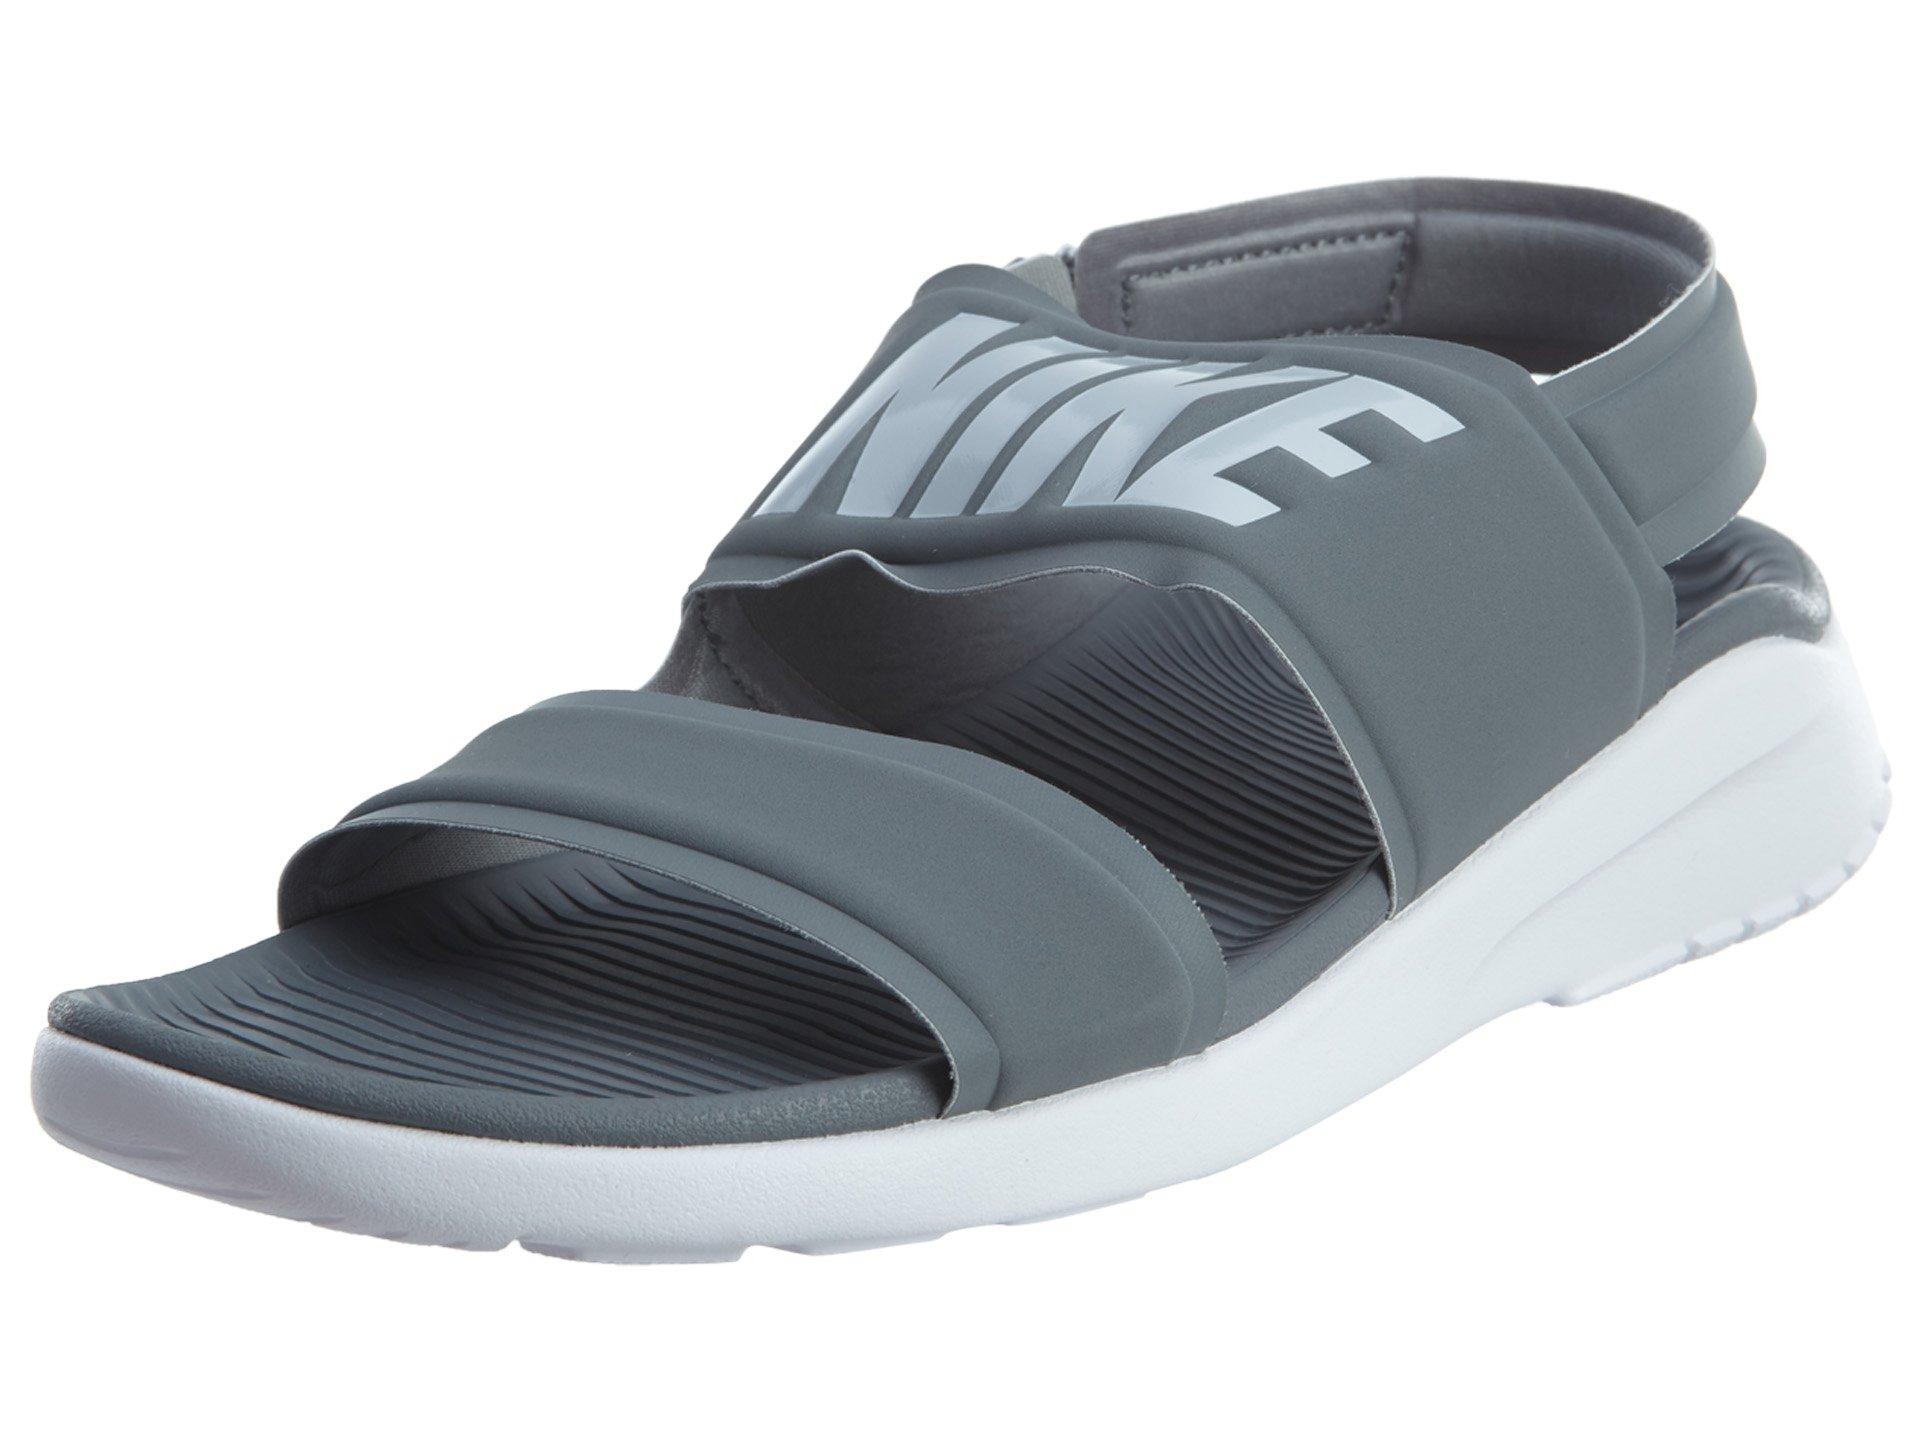 3e4fef401a78 Galleon - NIKE Womens Tanjun Sandal Cool Grey Pure Platinum White  882694-002 (10 B(M) US)